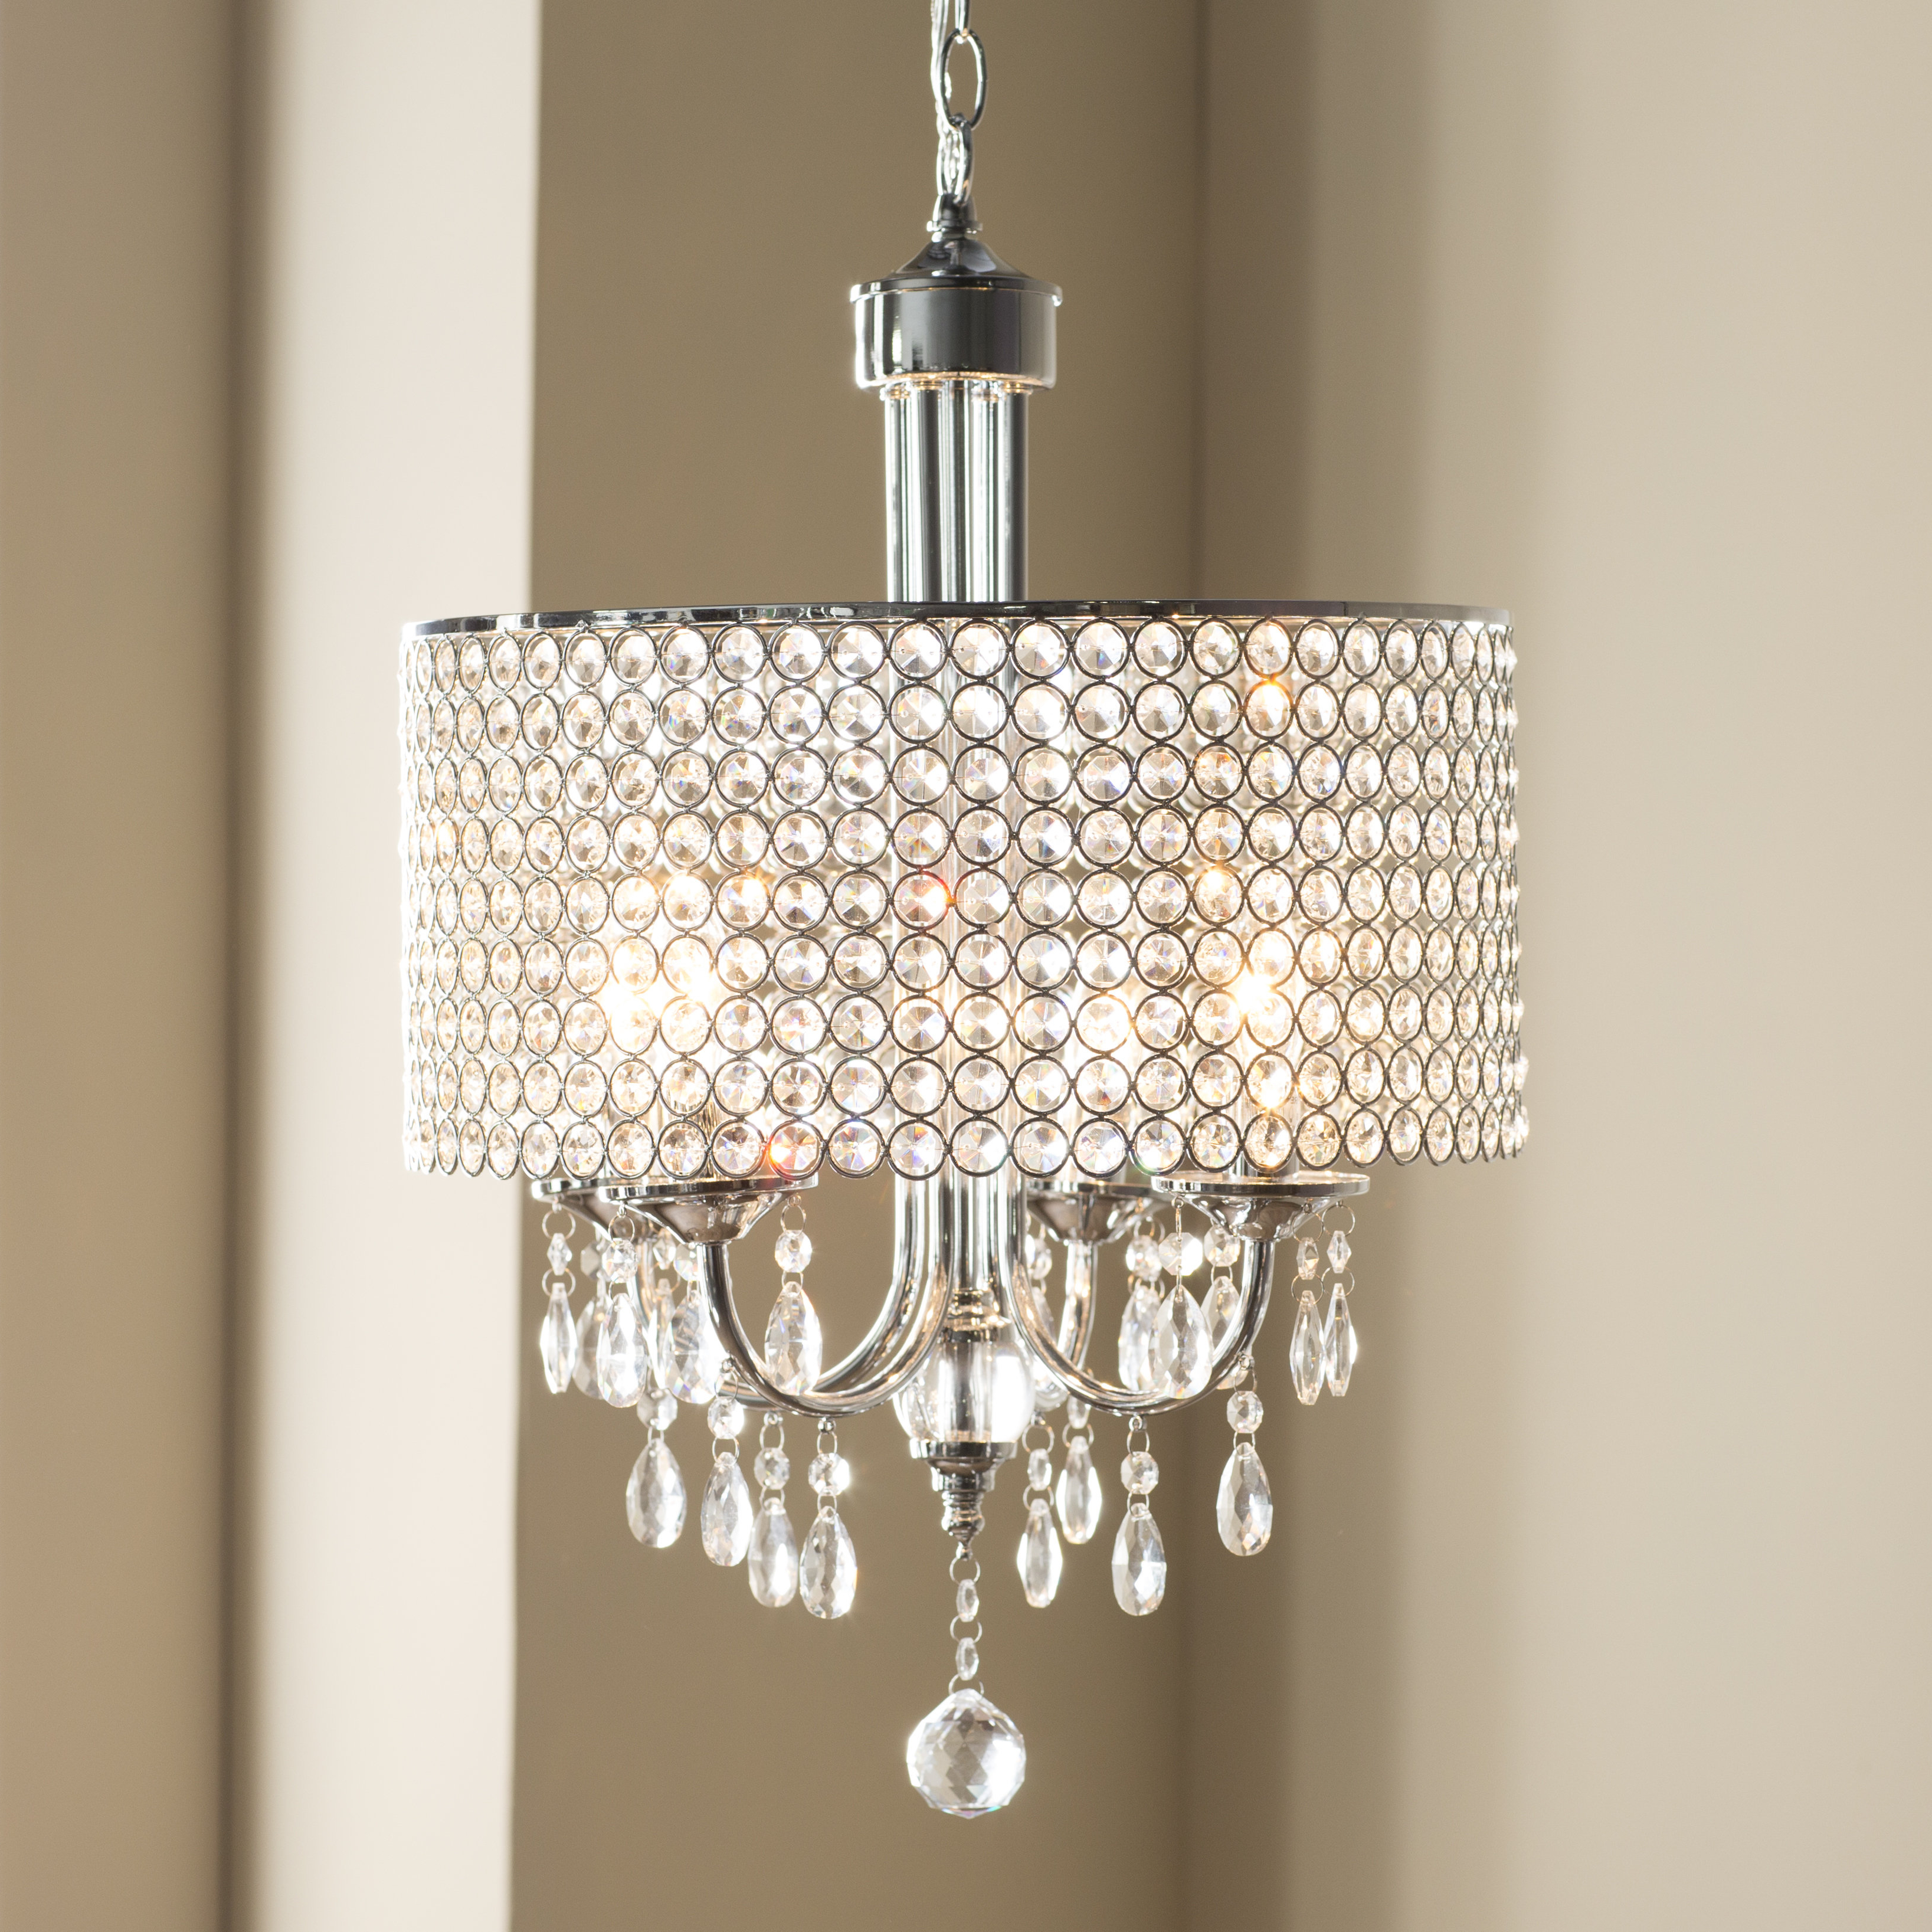 Favorite House Of Hampton Oldman 4 Light Crystal Chandelier Regarding Aldgate 4 Light Crystal Chandeliers (View 12 of 25)